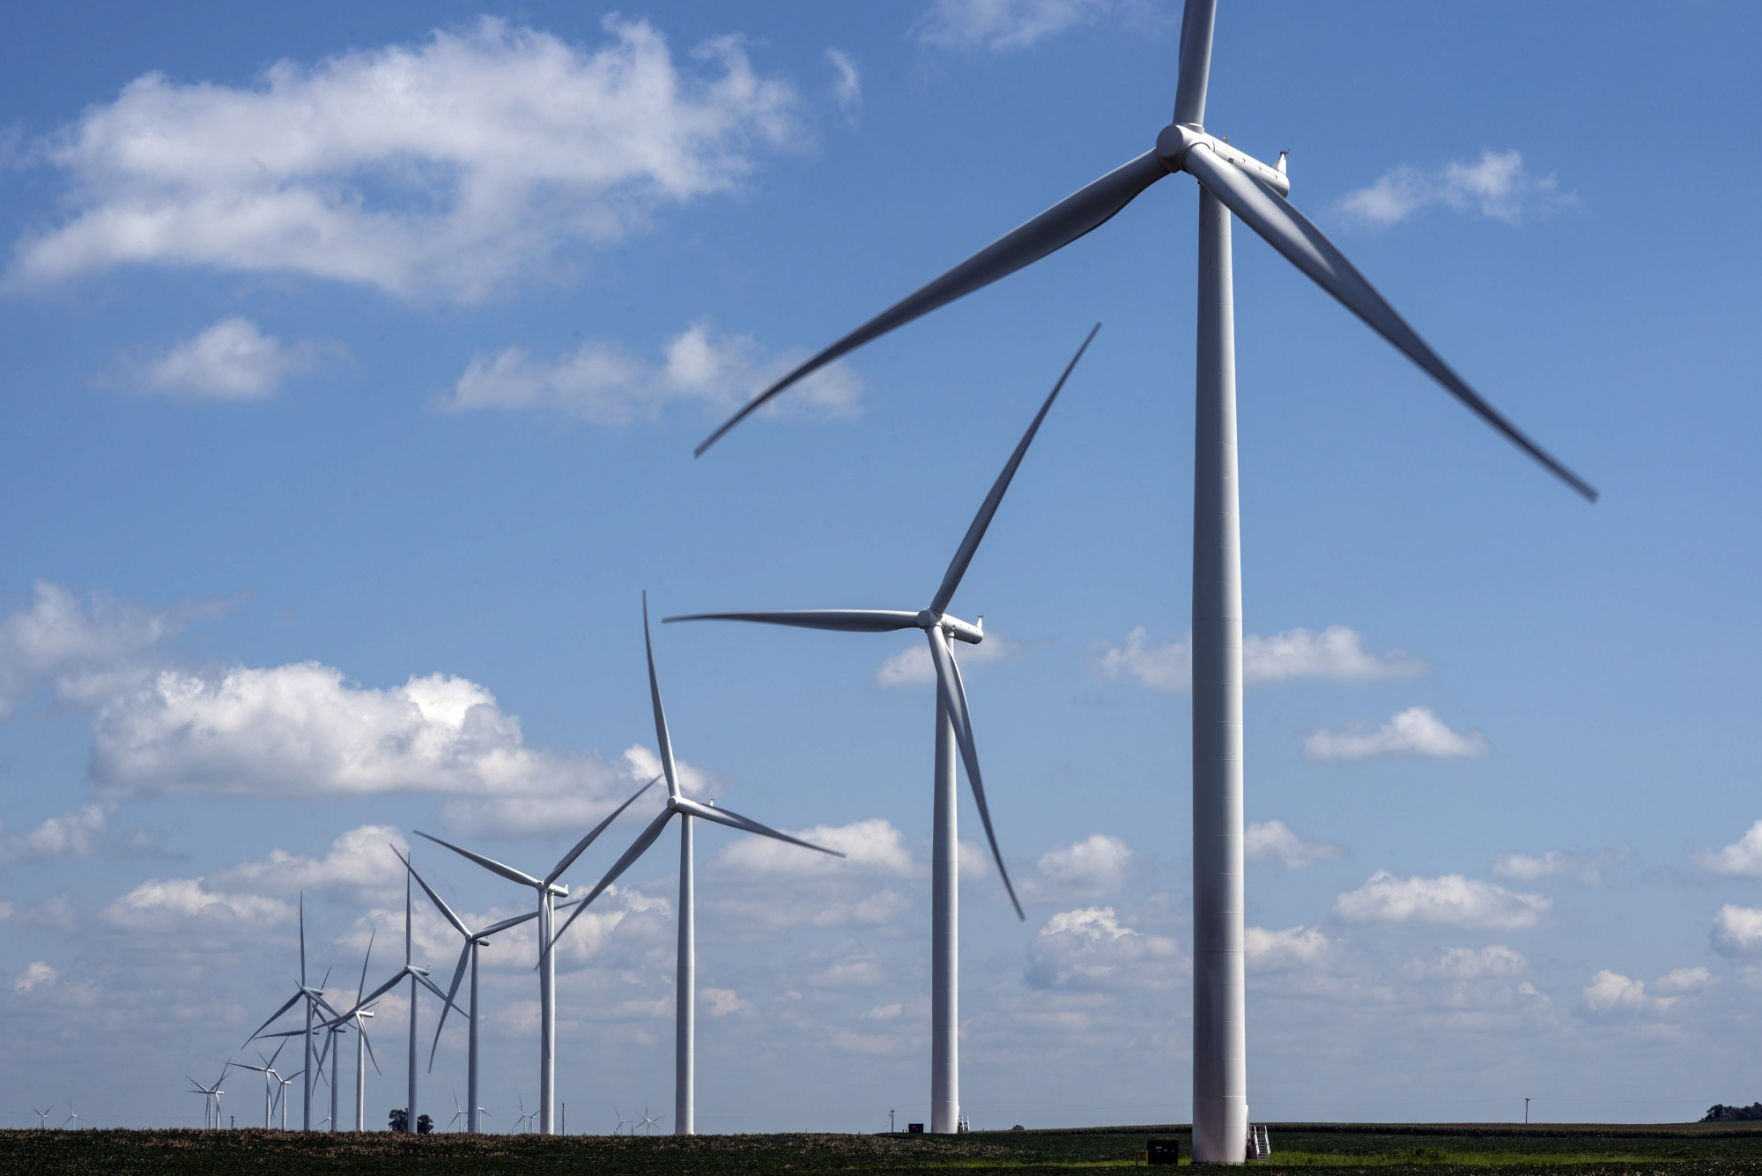 Oklahoma to House Largest Wind Farm